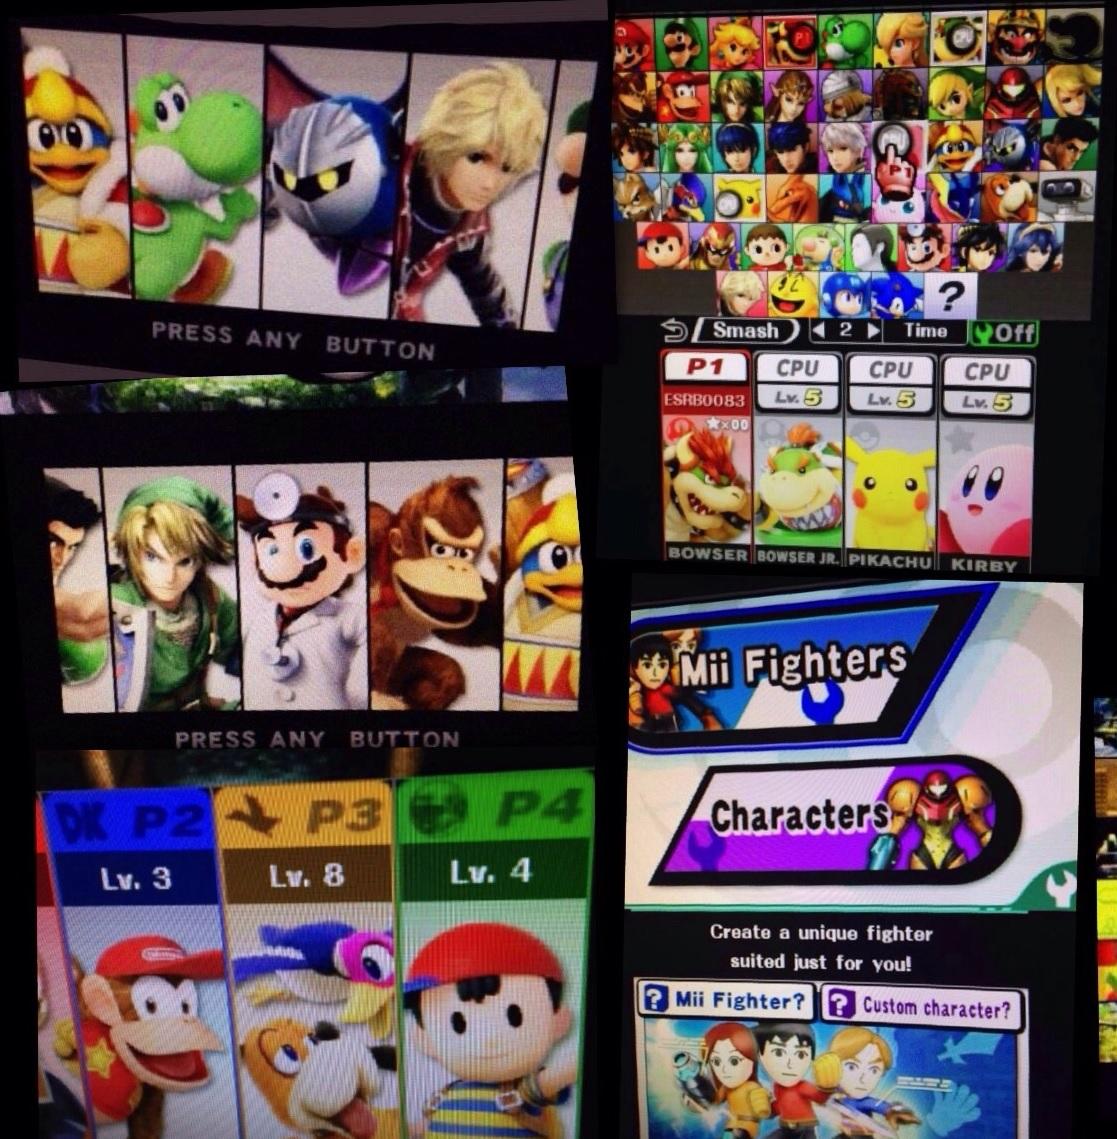 New Super Smash Bros Leak Details Videos Show Shulk